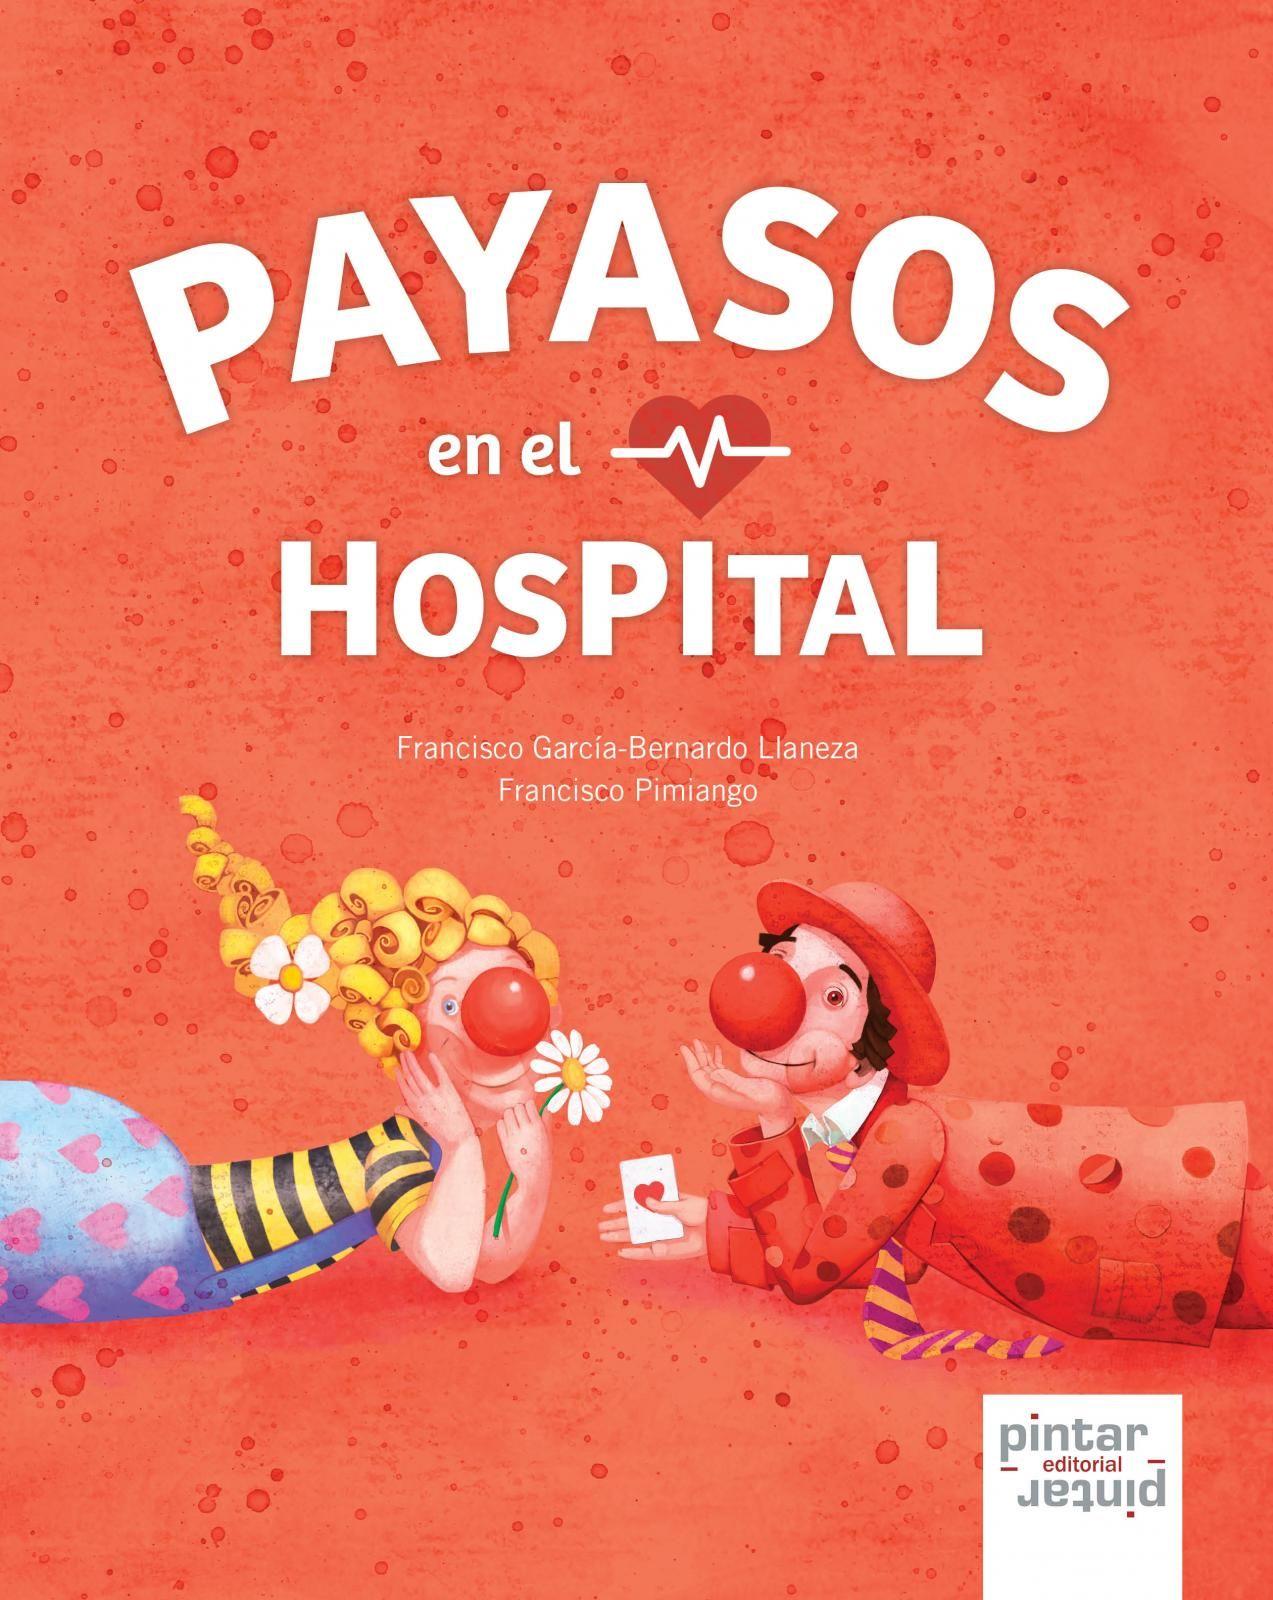 Pin by Pintar-Pintar Editorial on Payasos en el Hospital | Pinterest